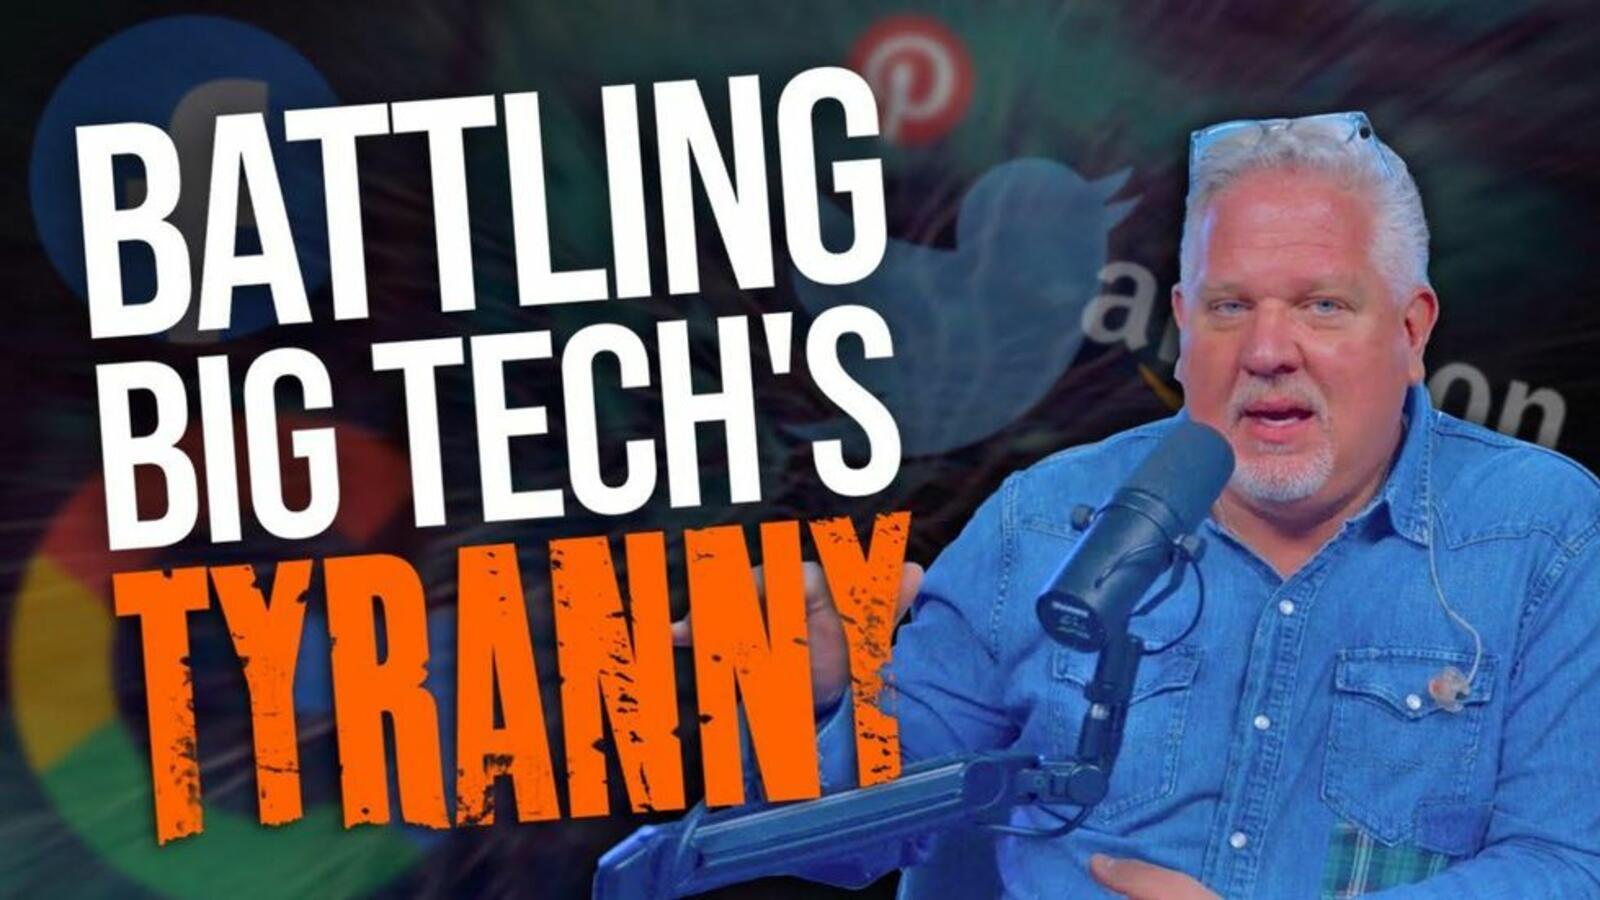 'Crazy, CREEPY stuff': Big Tech's MONOPOLY over speech & how to dismantl...